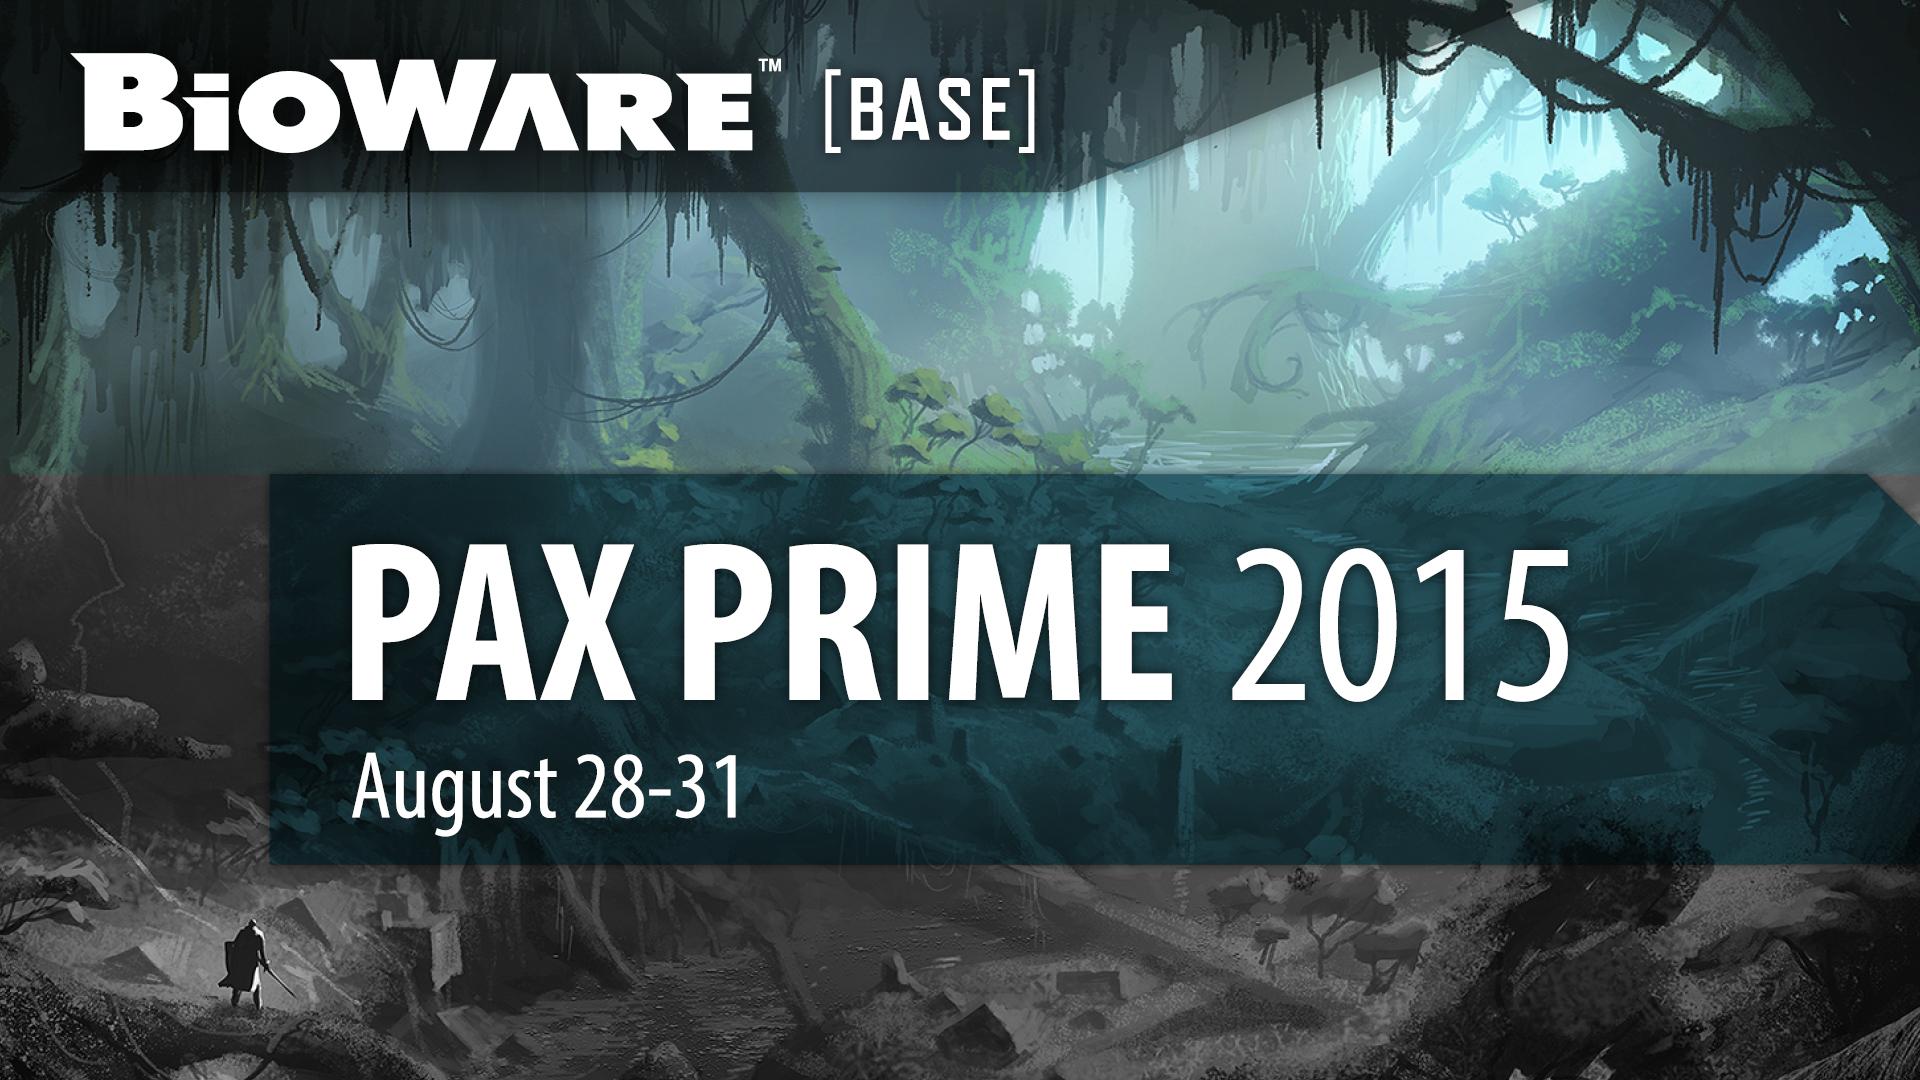 BioWare Base at PAX Prime